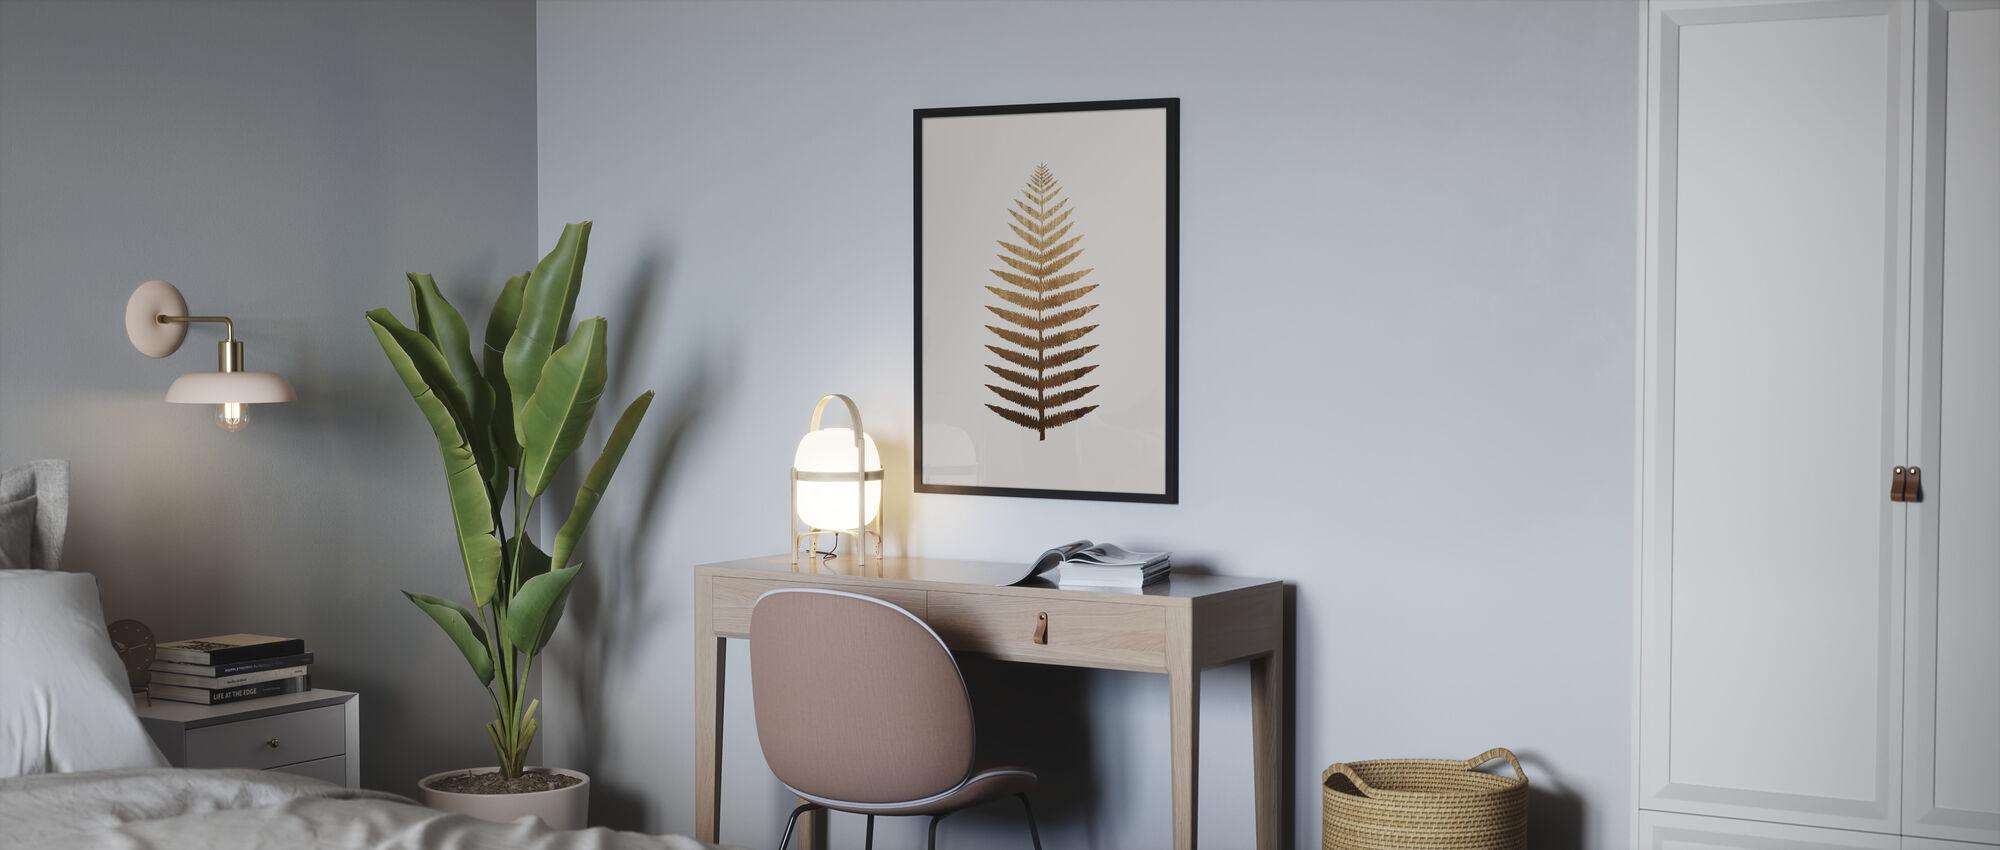 Goldenes Blatt Nr. 7 - Poster - Schlafzimmer